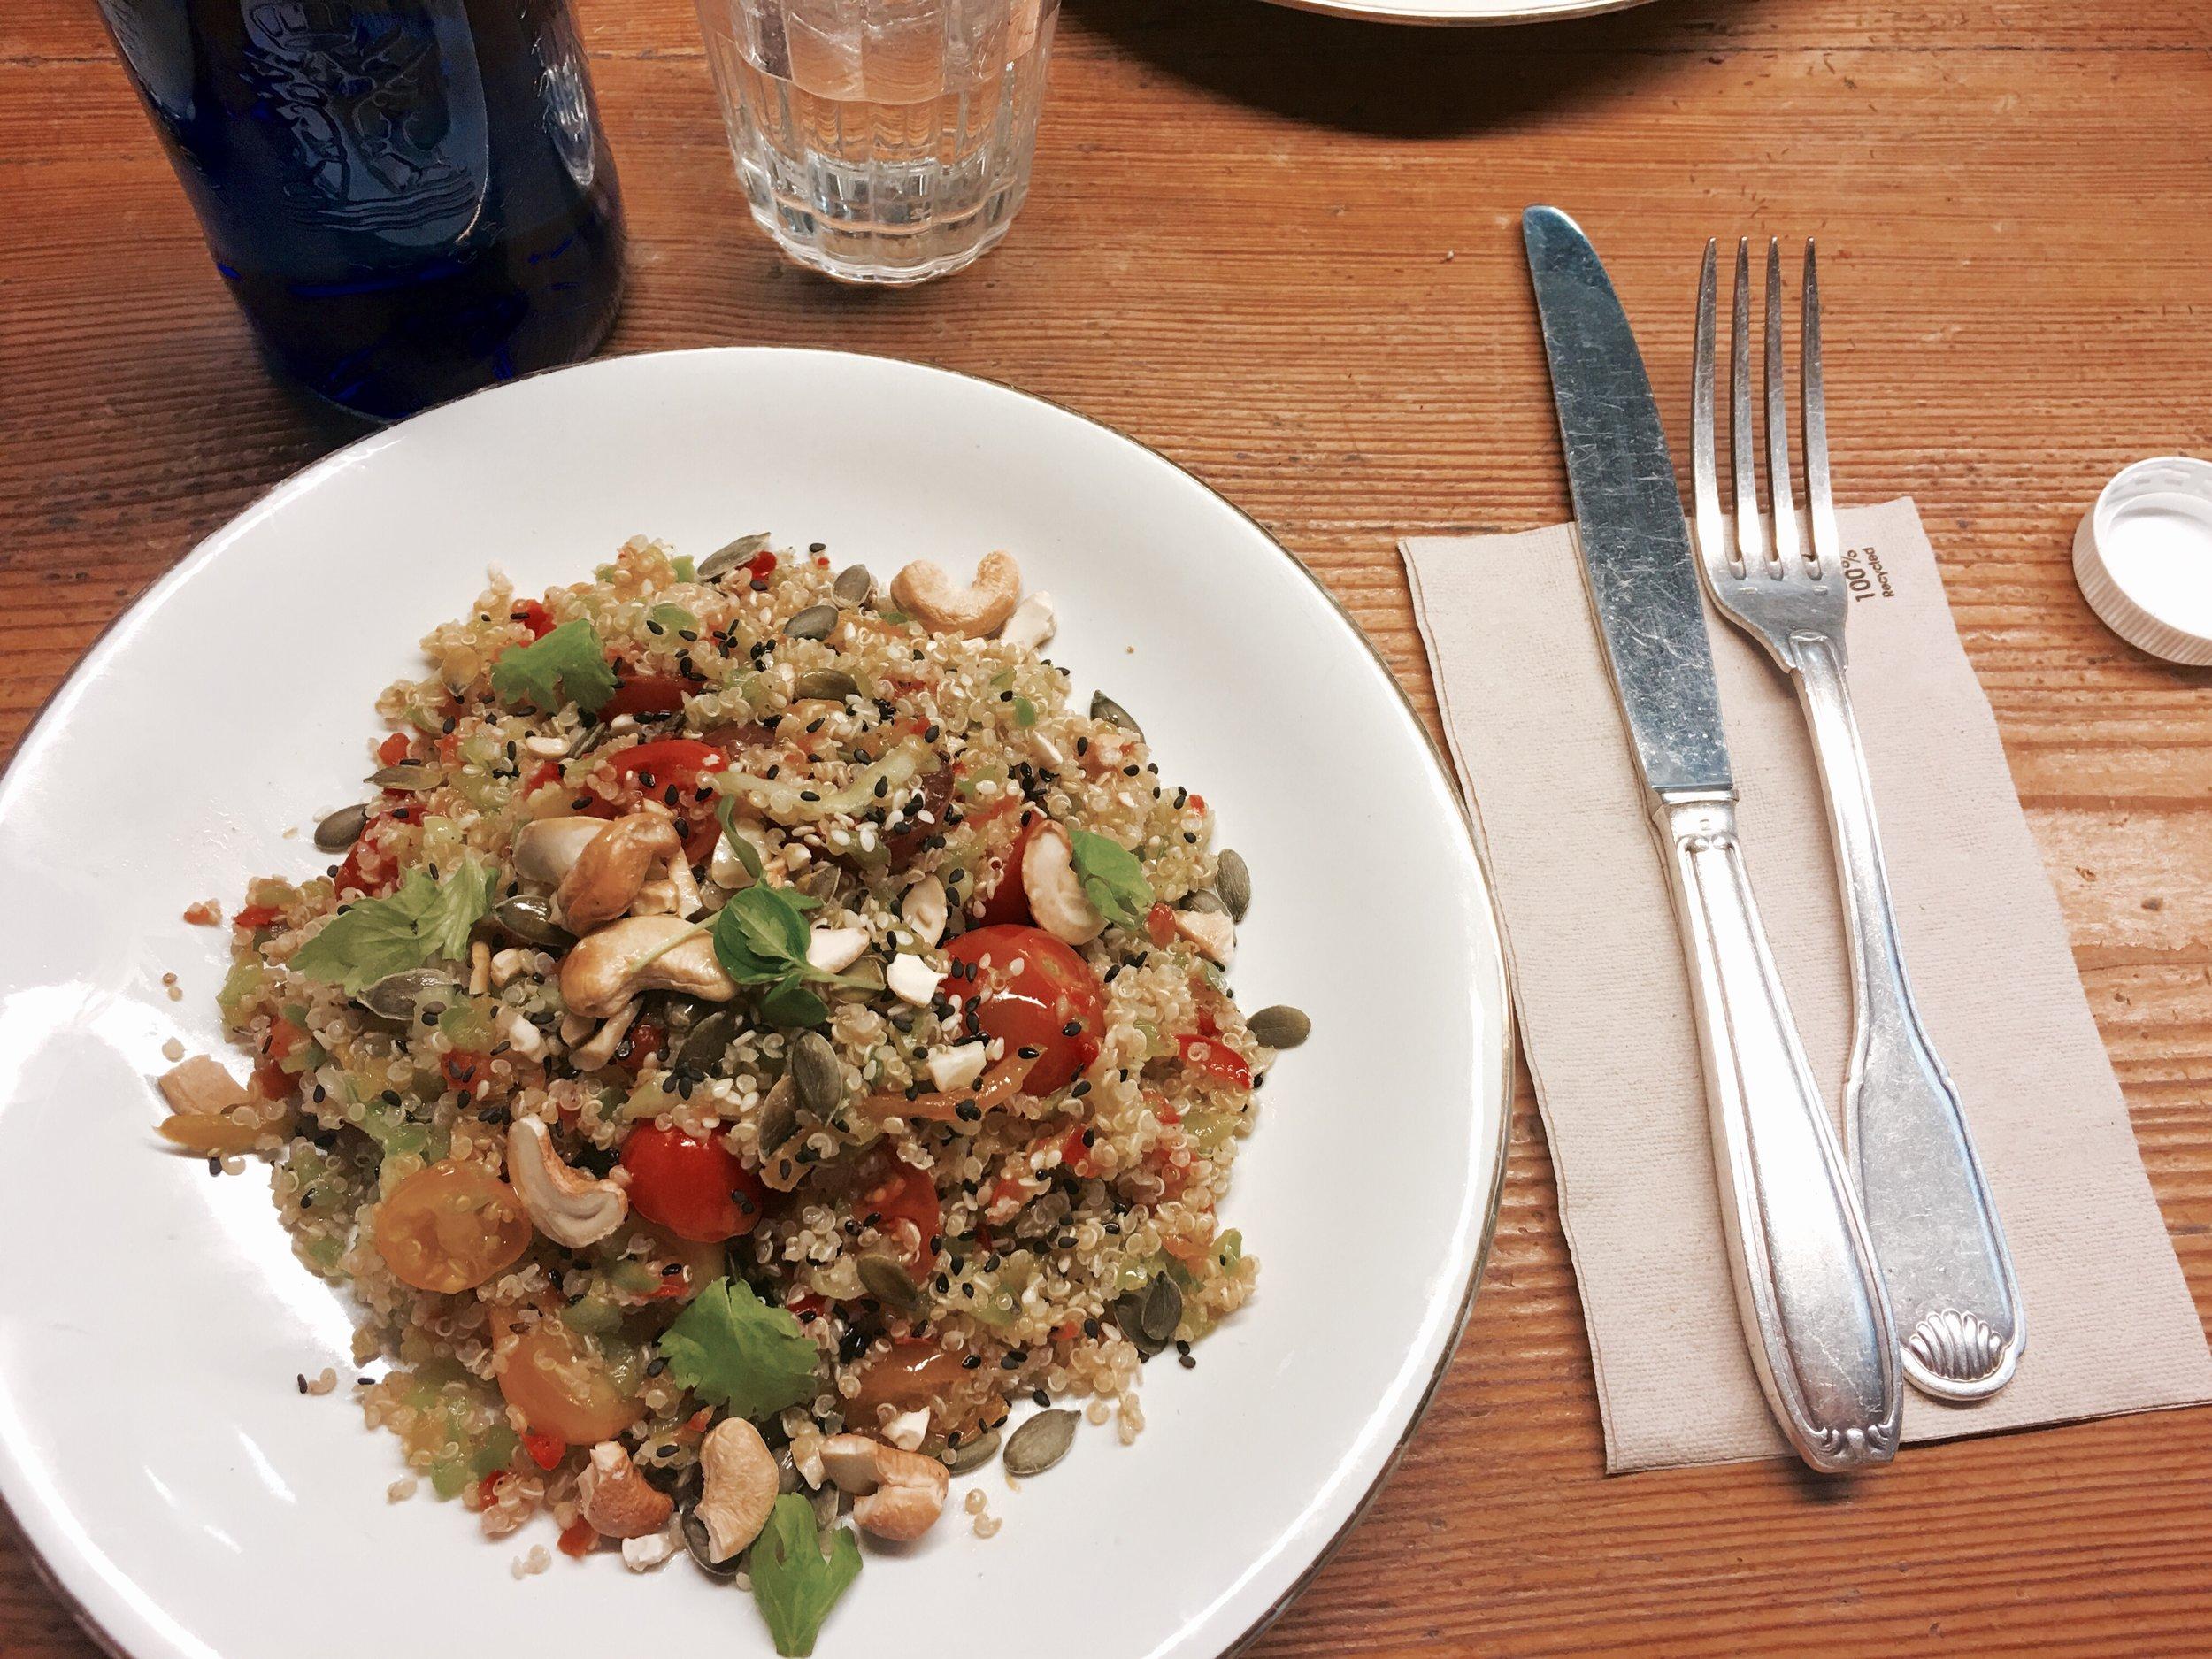 Ensalada de quinoa con anacardos, pepino y verduras.